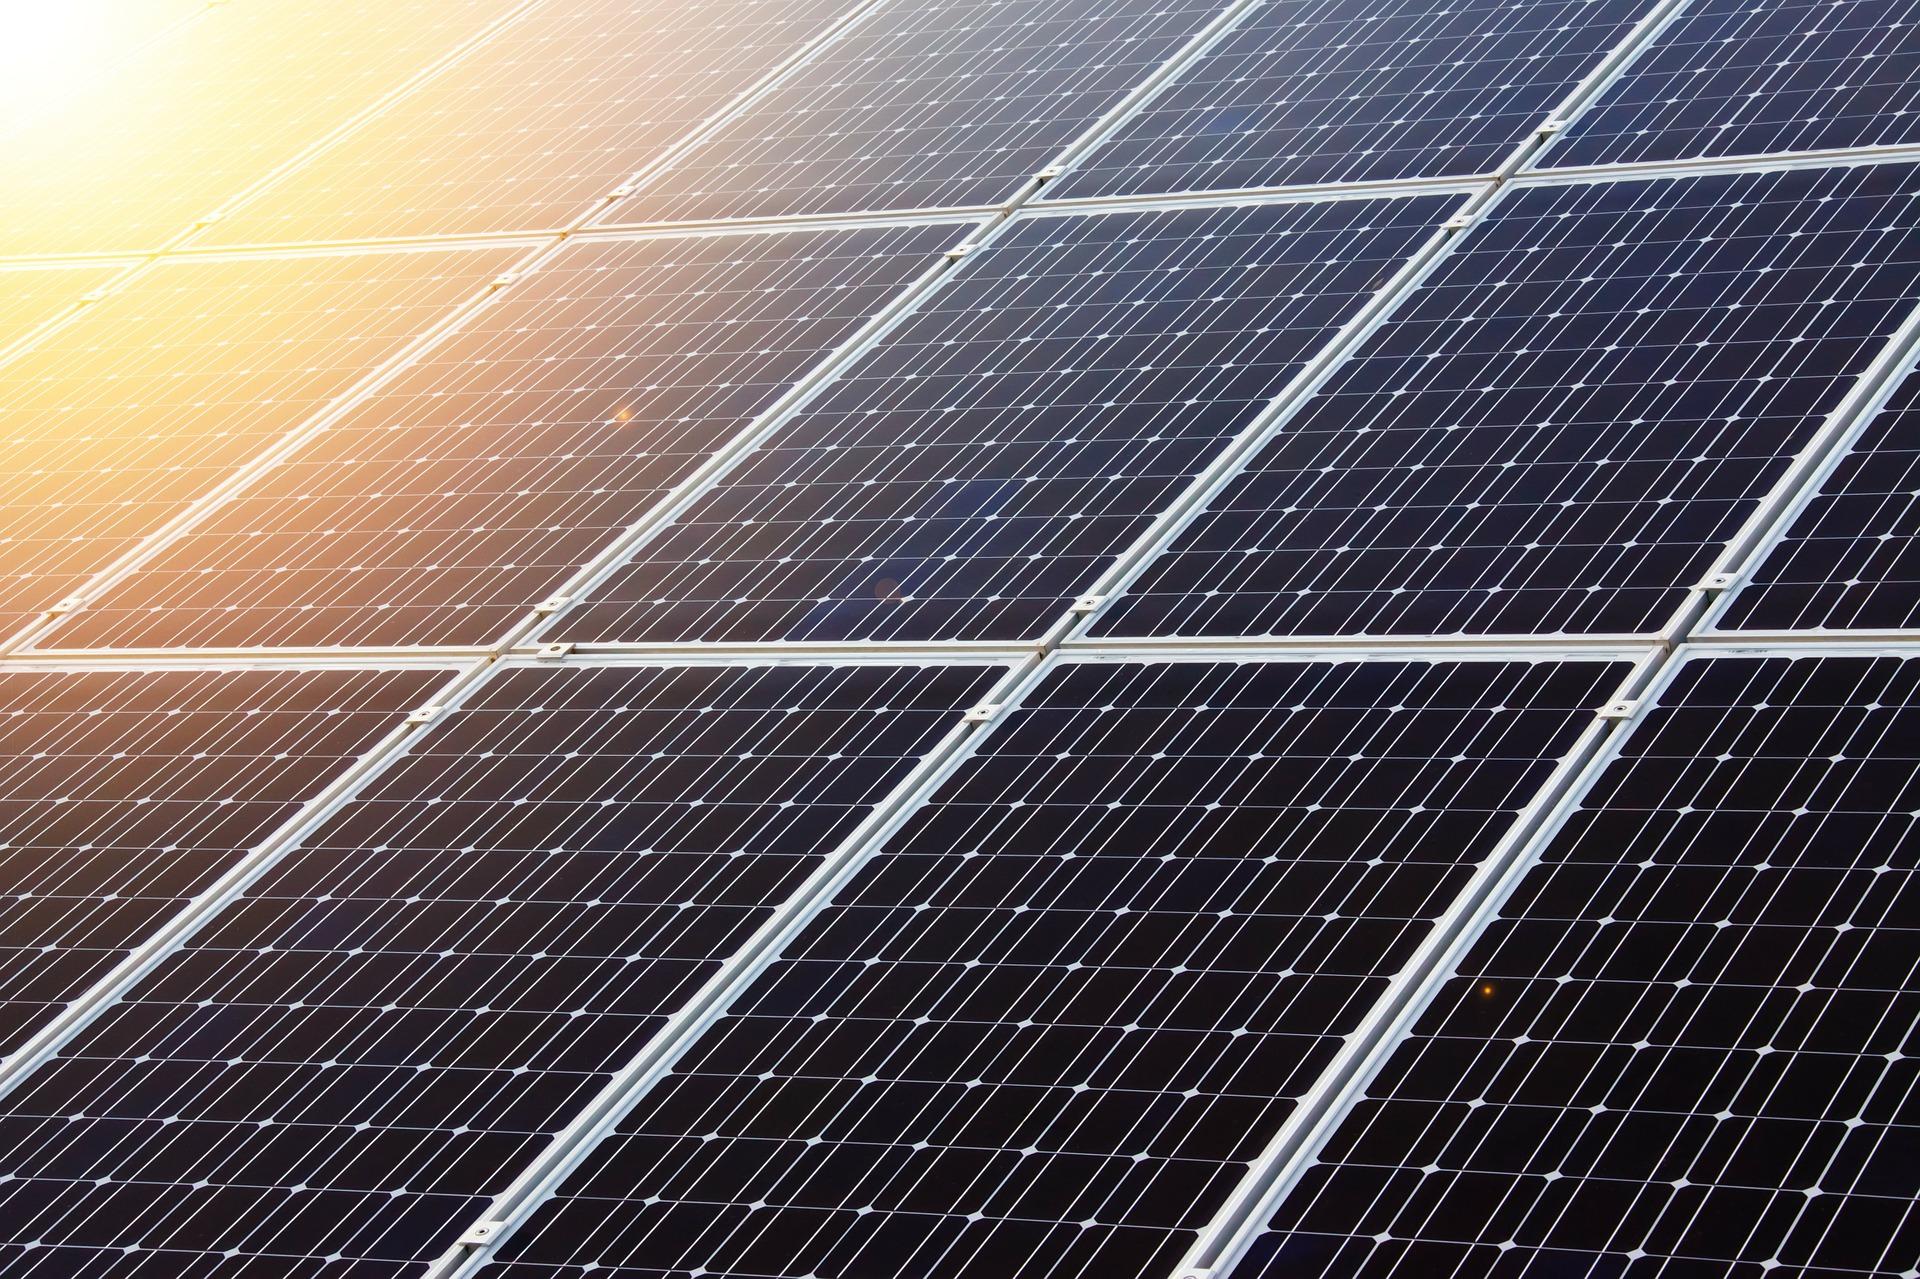 M%c3%b3dulos-solares-en-serie-o-paralelo